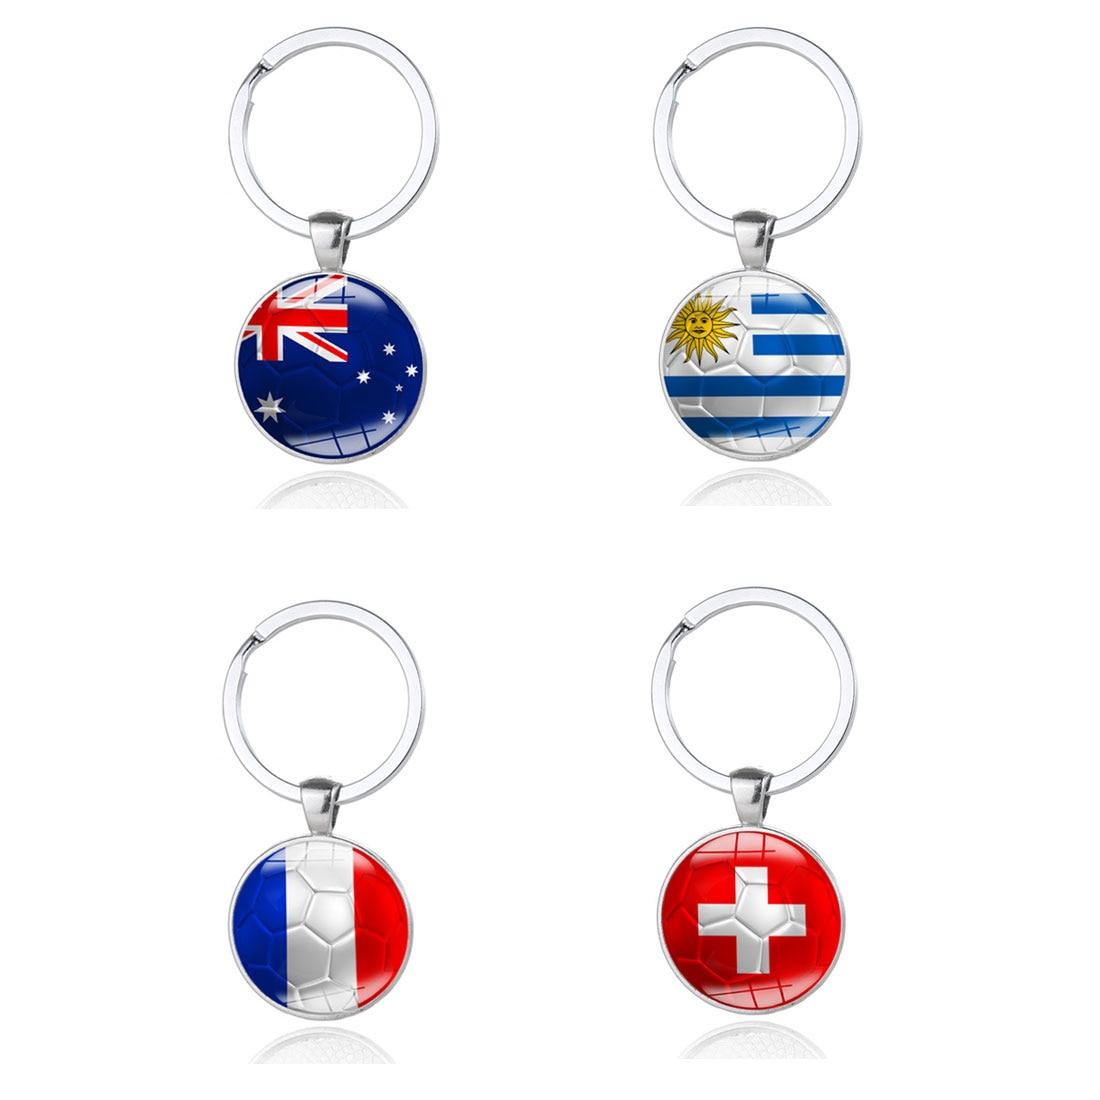 Football Keychains Key ring 32 Countries Peru Sweden Tunisia Senegal Soccer Key Chains Souvenir